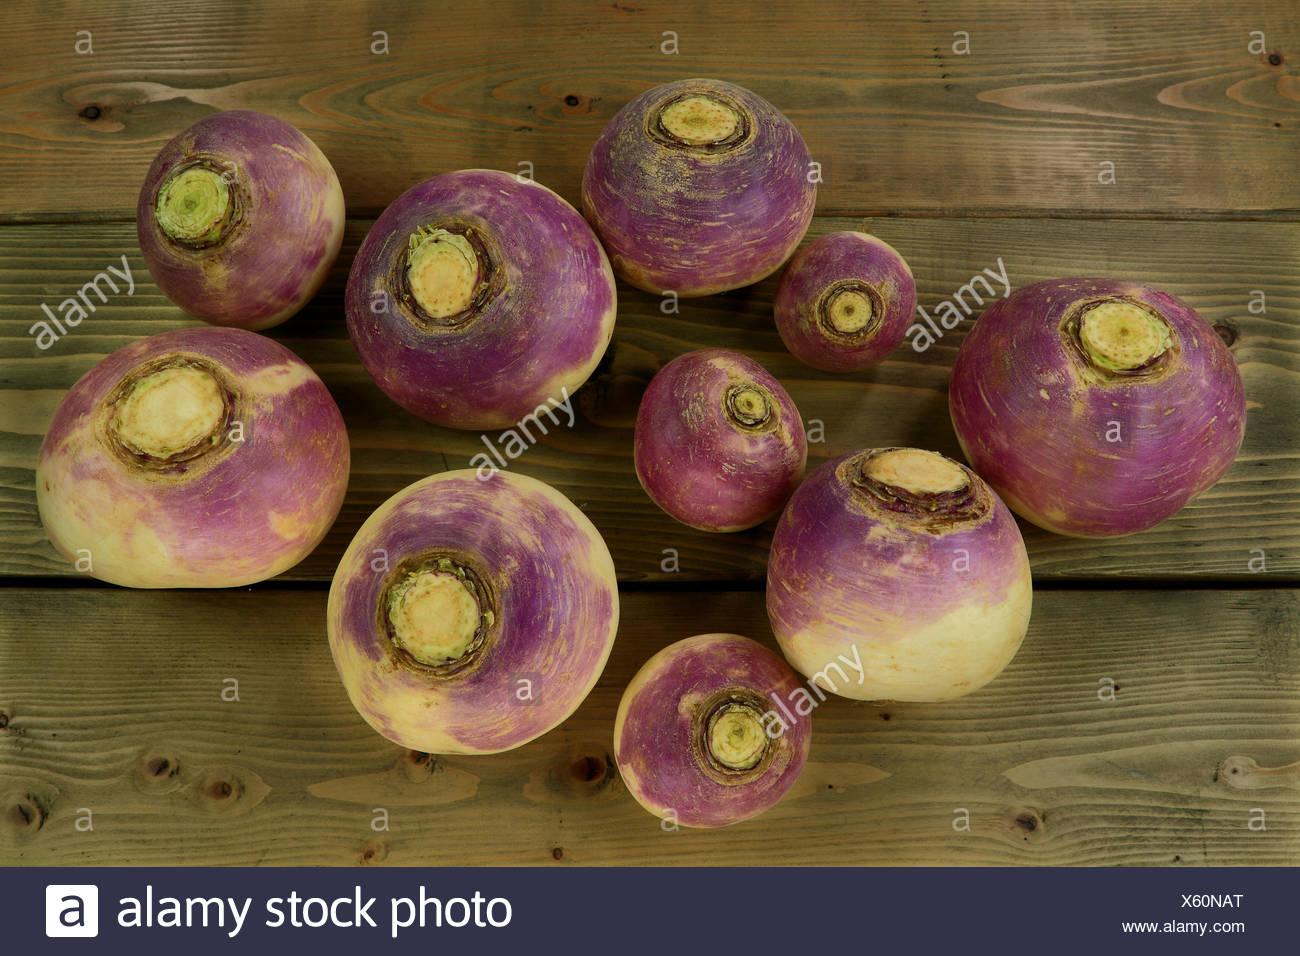 Nabo raíces vegetales Imagen De Stock